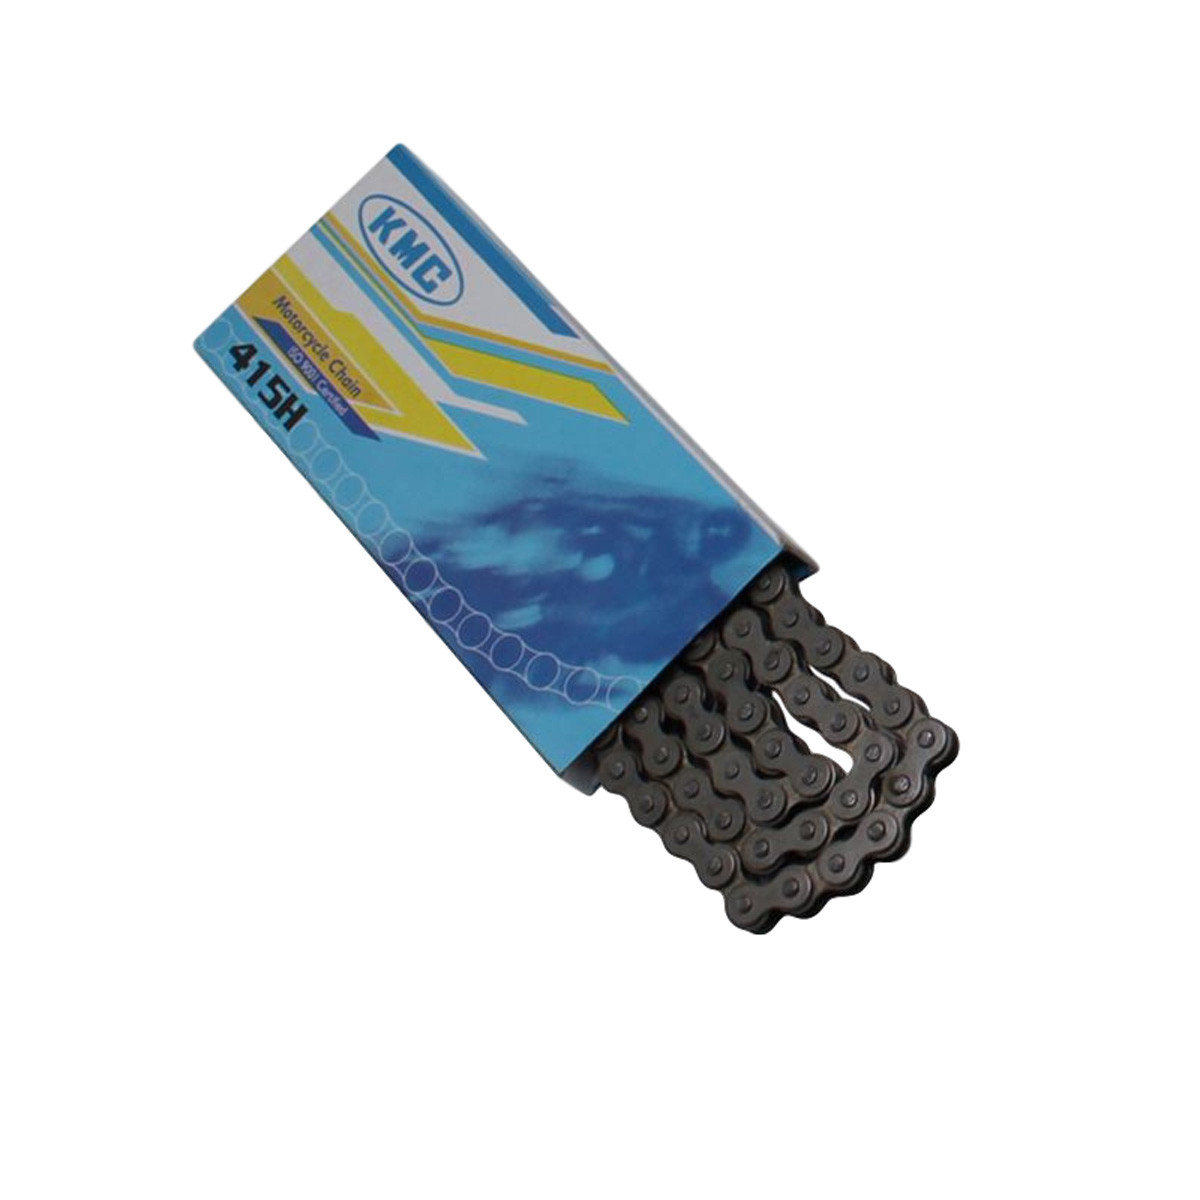 Chaîne 415 132 Maillons - KMC Standard